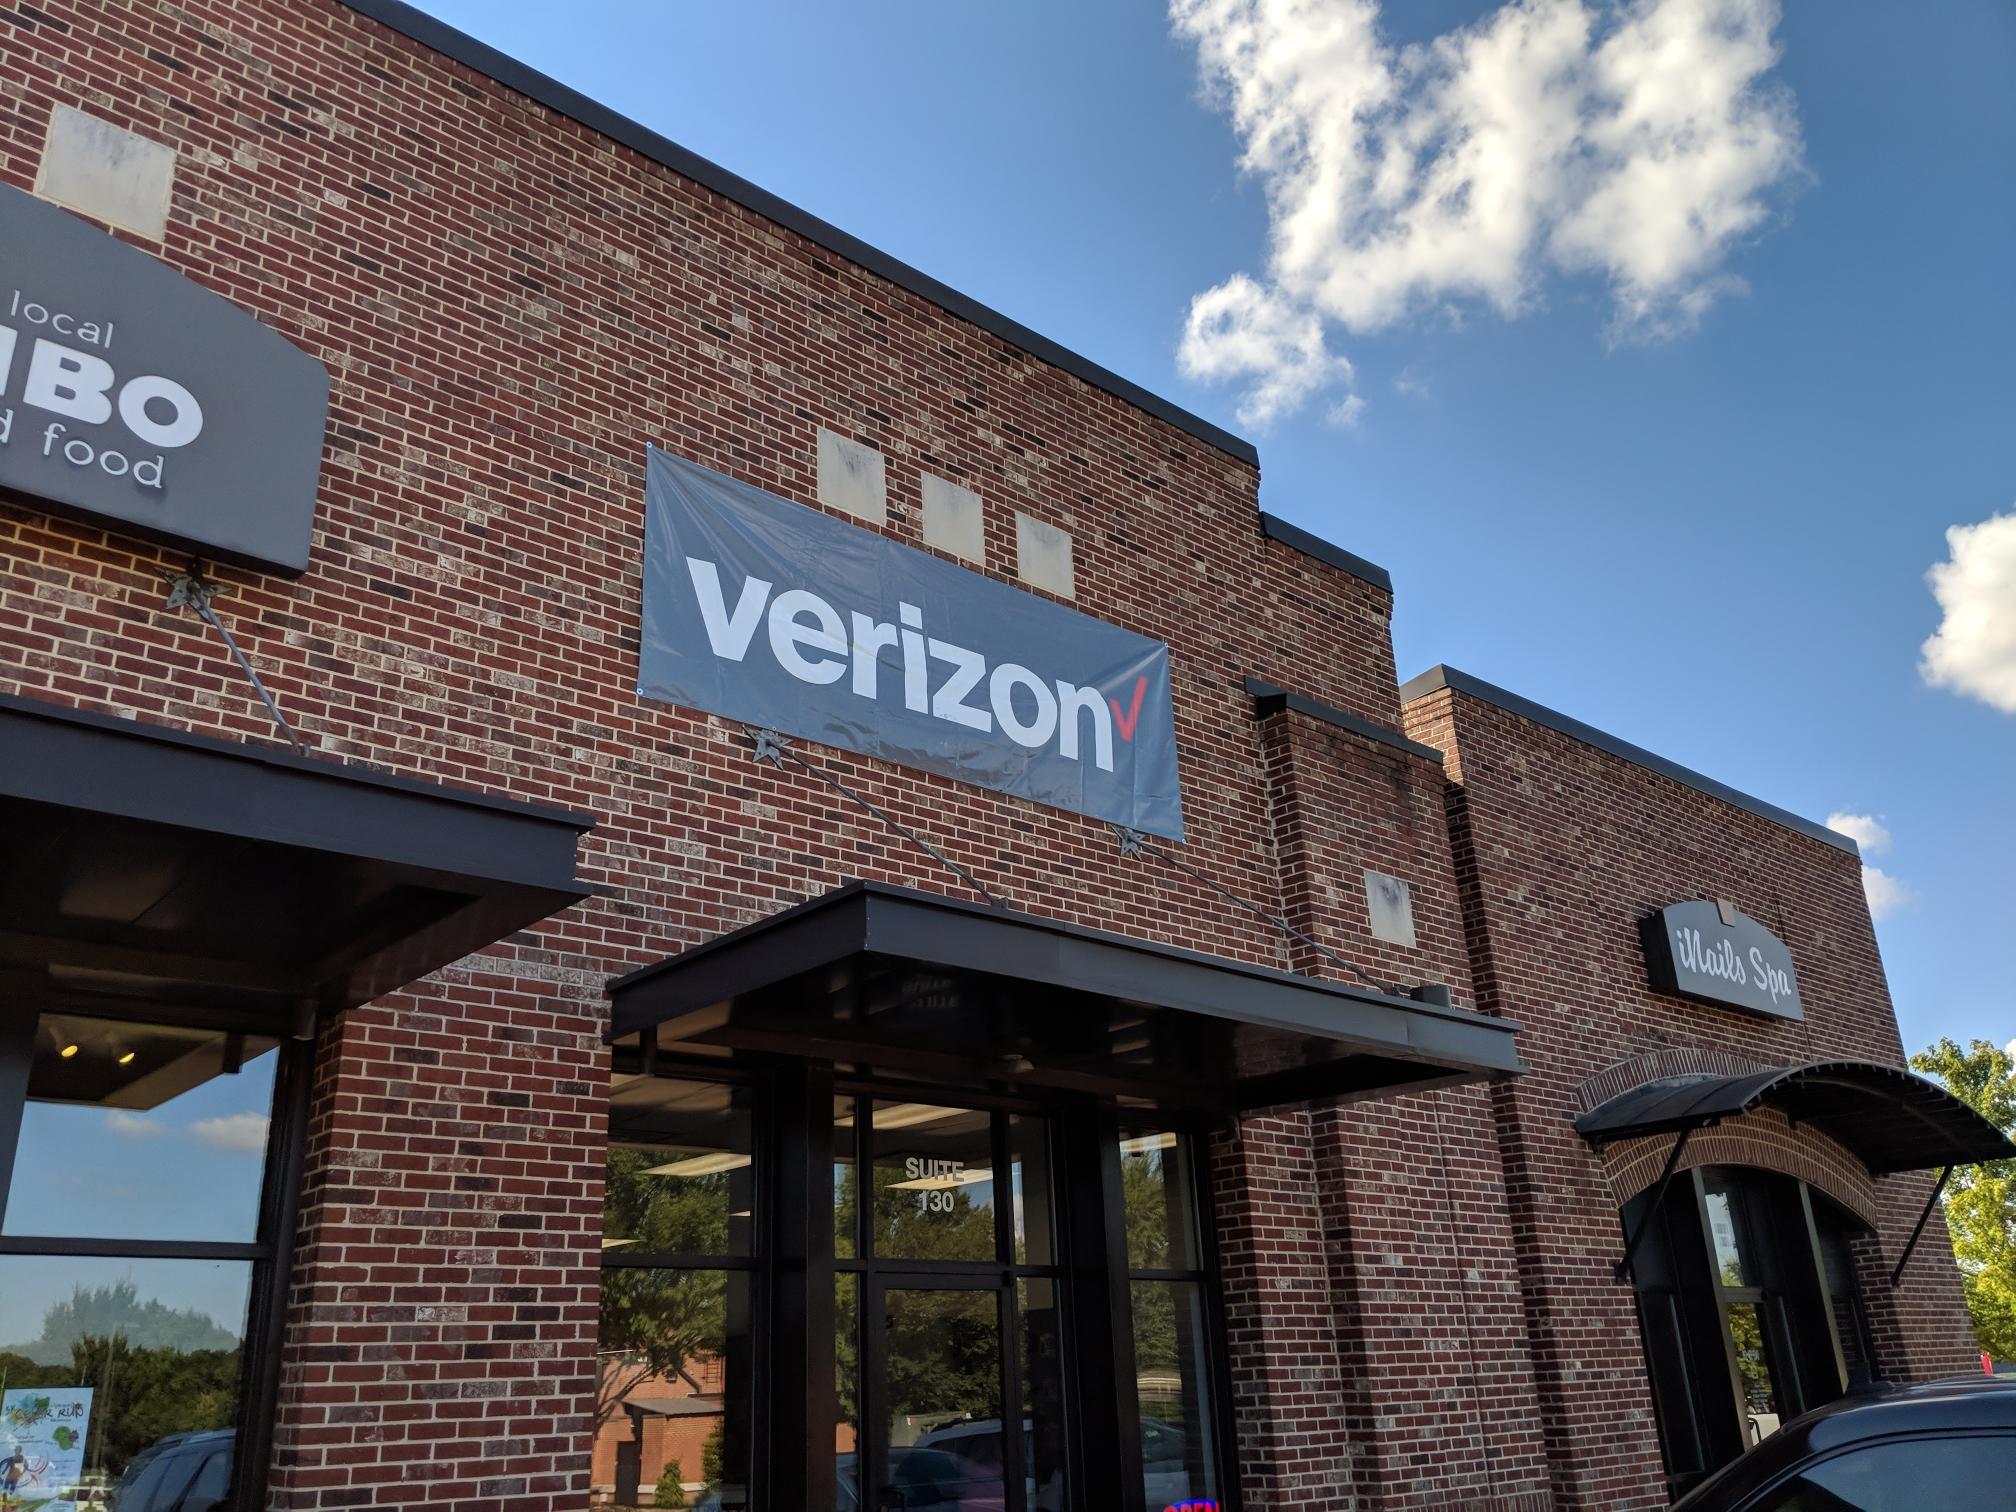 Verizon Authorized Retailer - Wireless Zone image 2